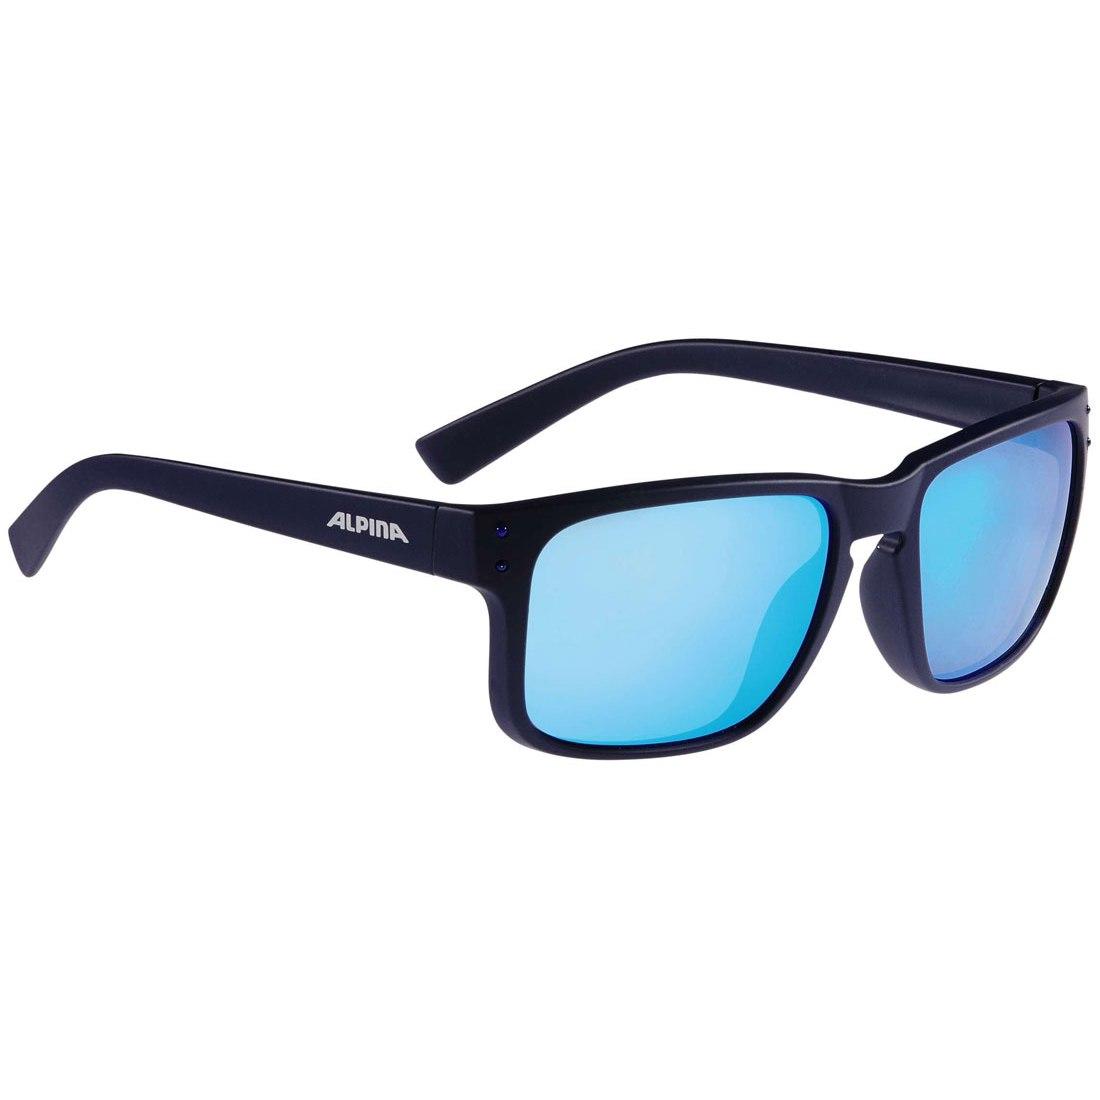 Alpina Kosmic Glasses - Nightblue Matt/CeramiC Blue Mirror